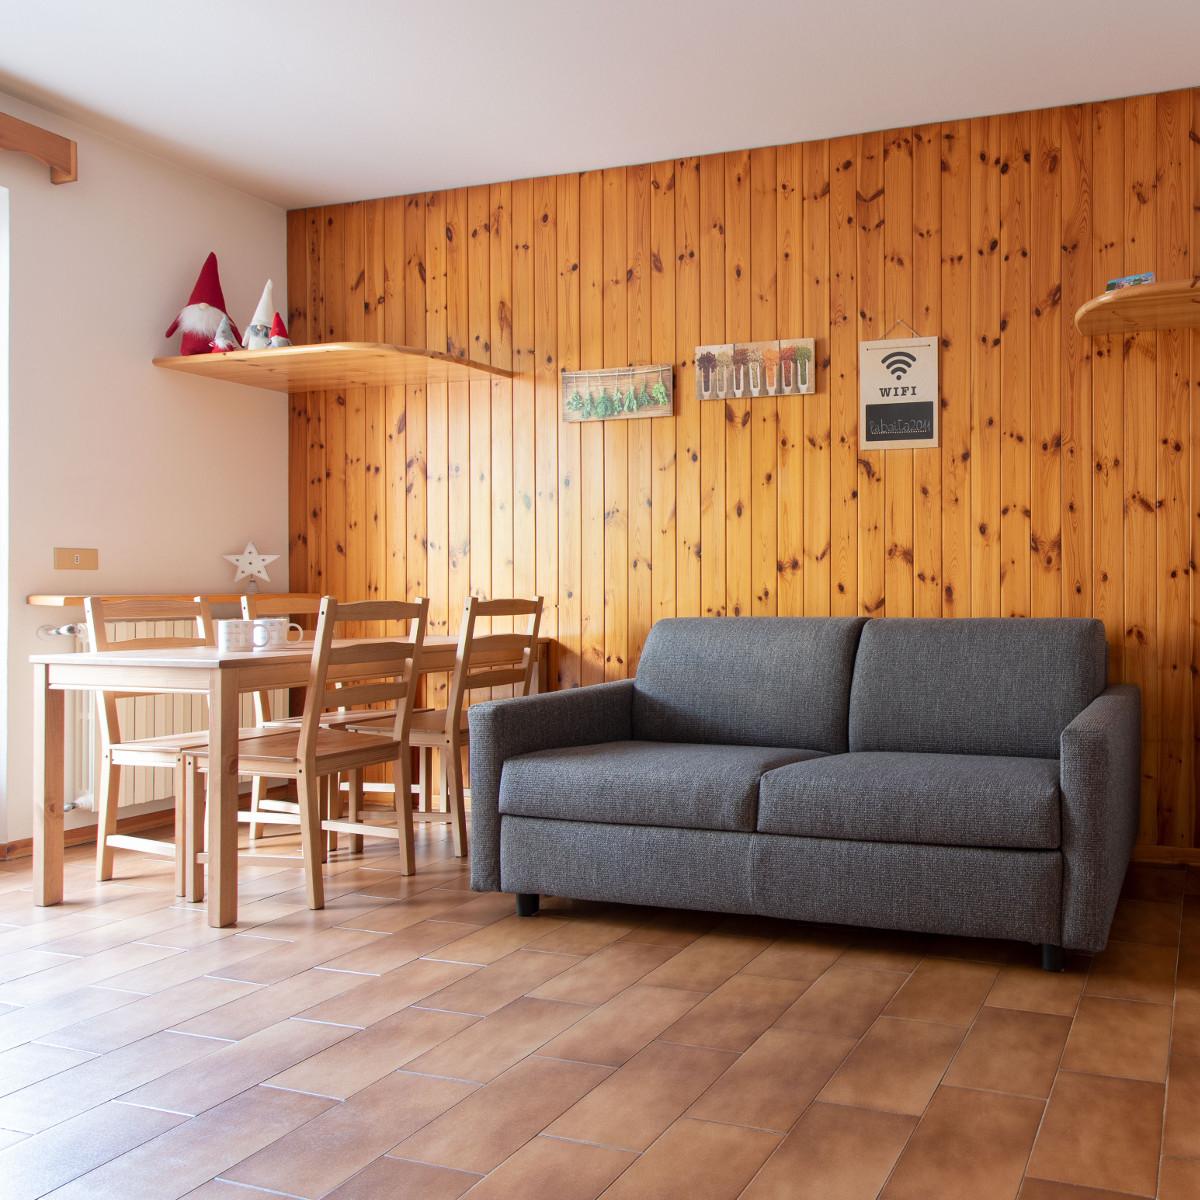 appartamento_italianway_belvedere_28_stella_bianca_foto_evidenza